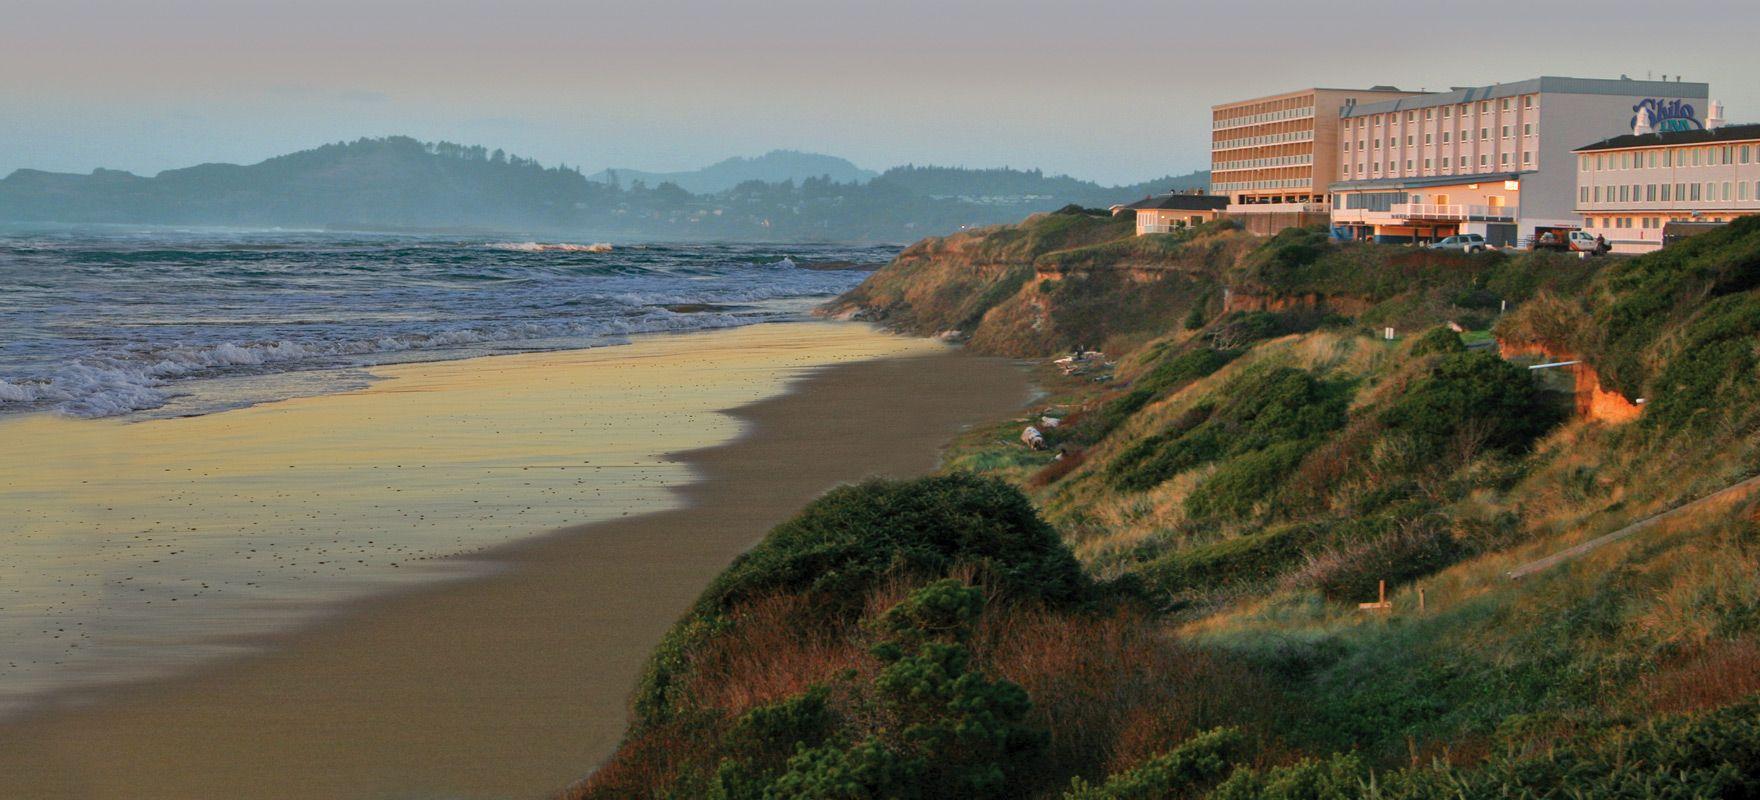 Official Website Shilo Inns Suites Hotels Newport Oregon